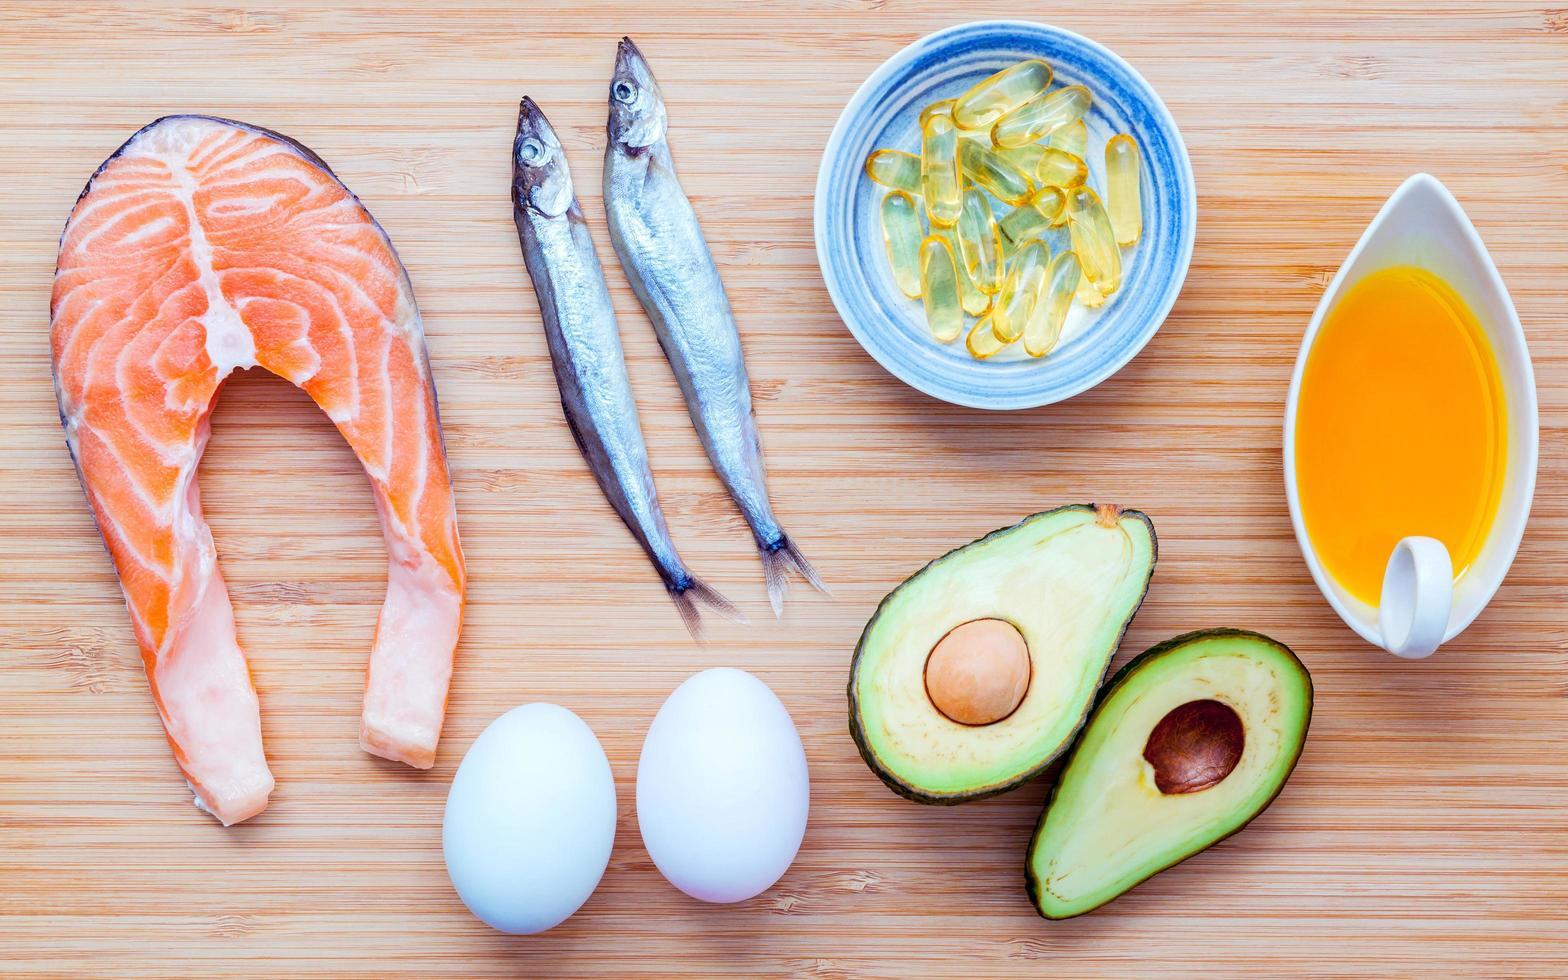 Healthy food items photo